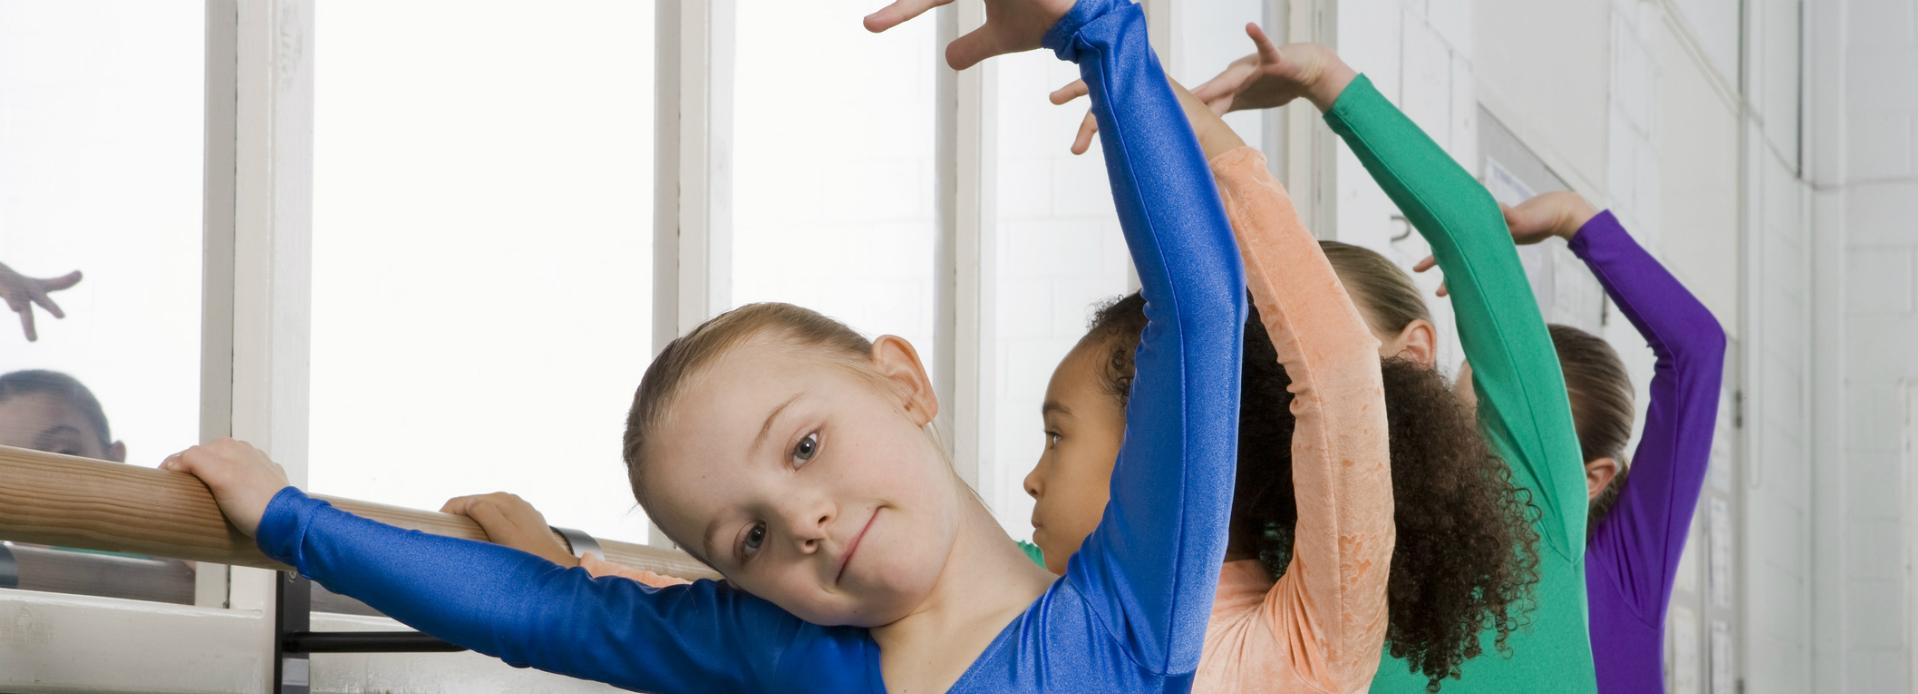 McKinney Dance Academy image 5